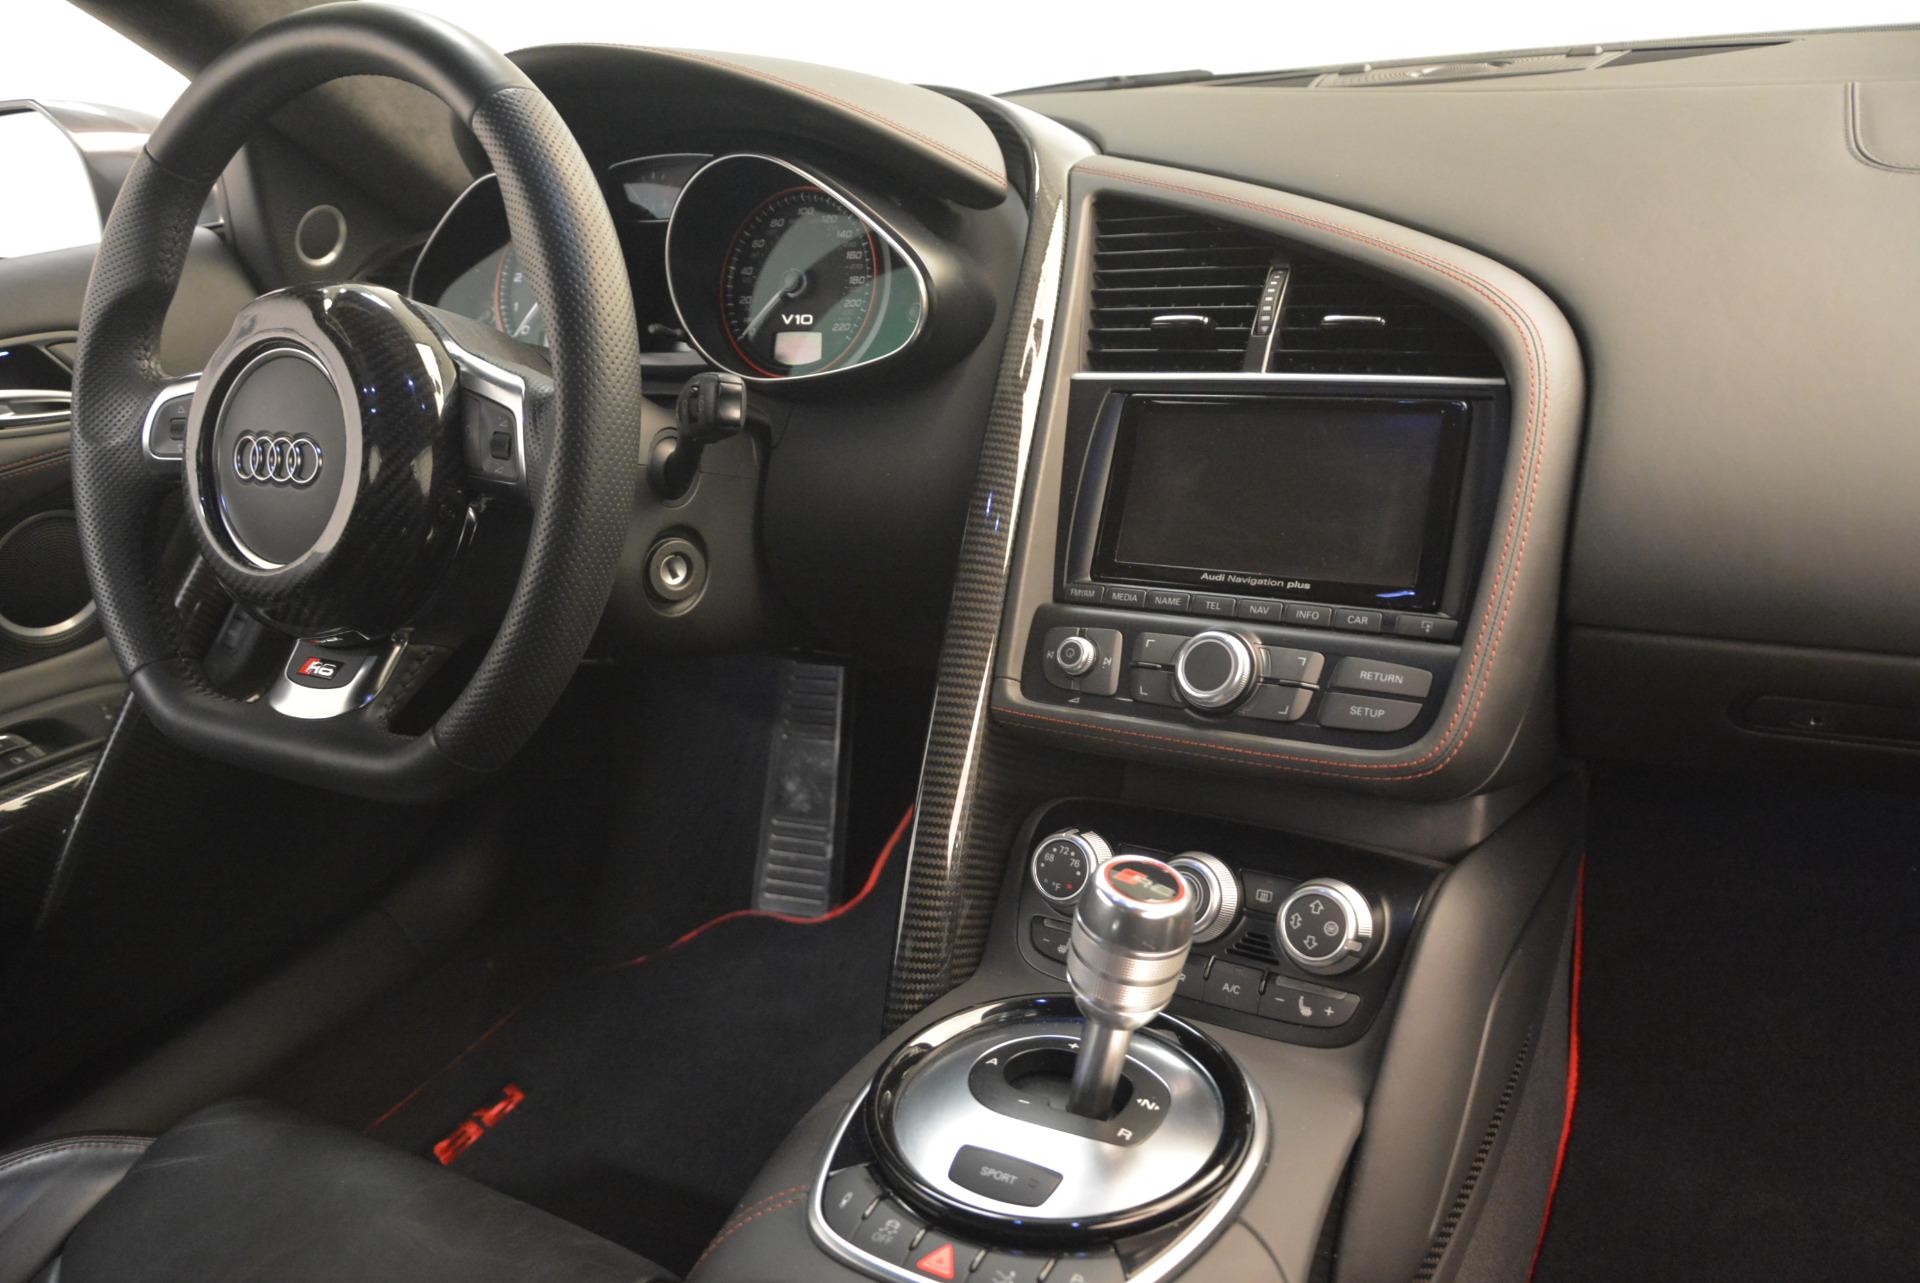 Used 2014 Audi R8 5.2 quattro For Sale In Greenwich, CT 2147_p20